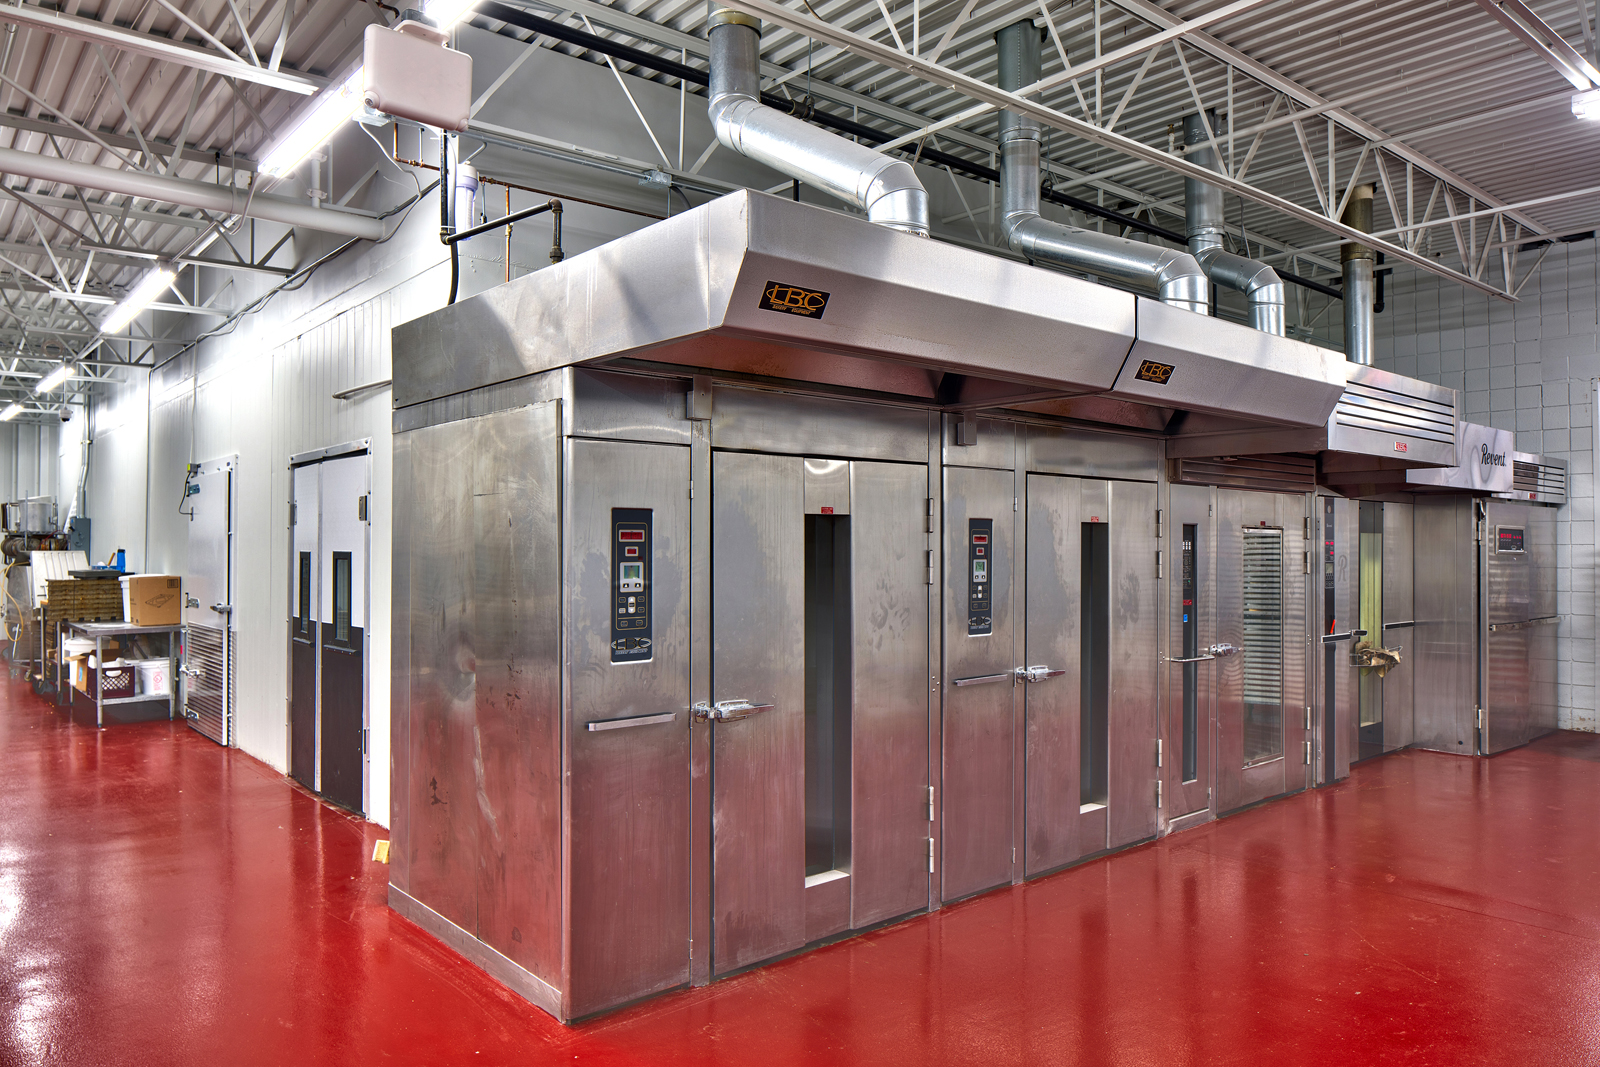 leos-bakery-ovens.jpg